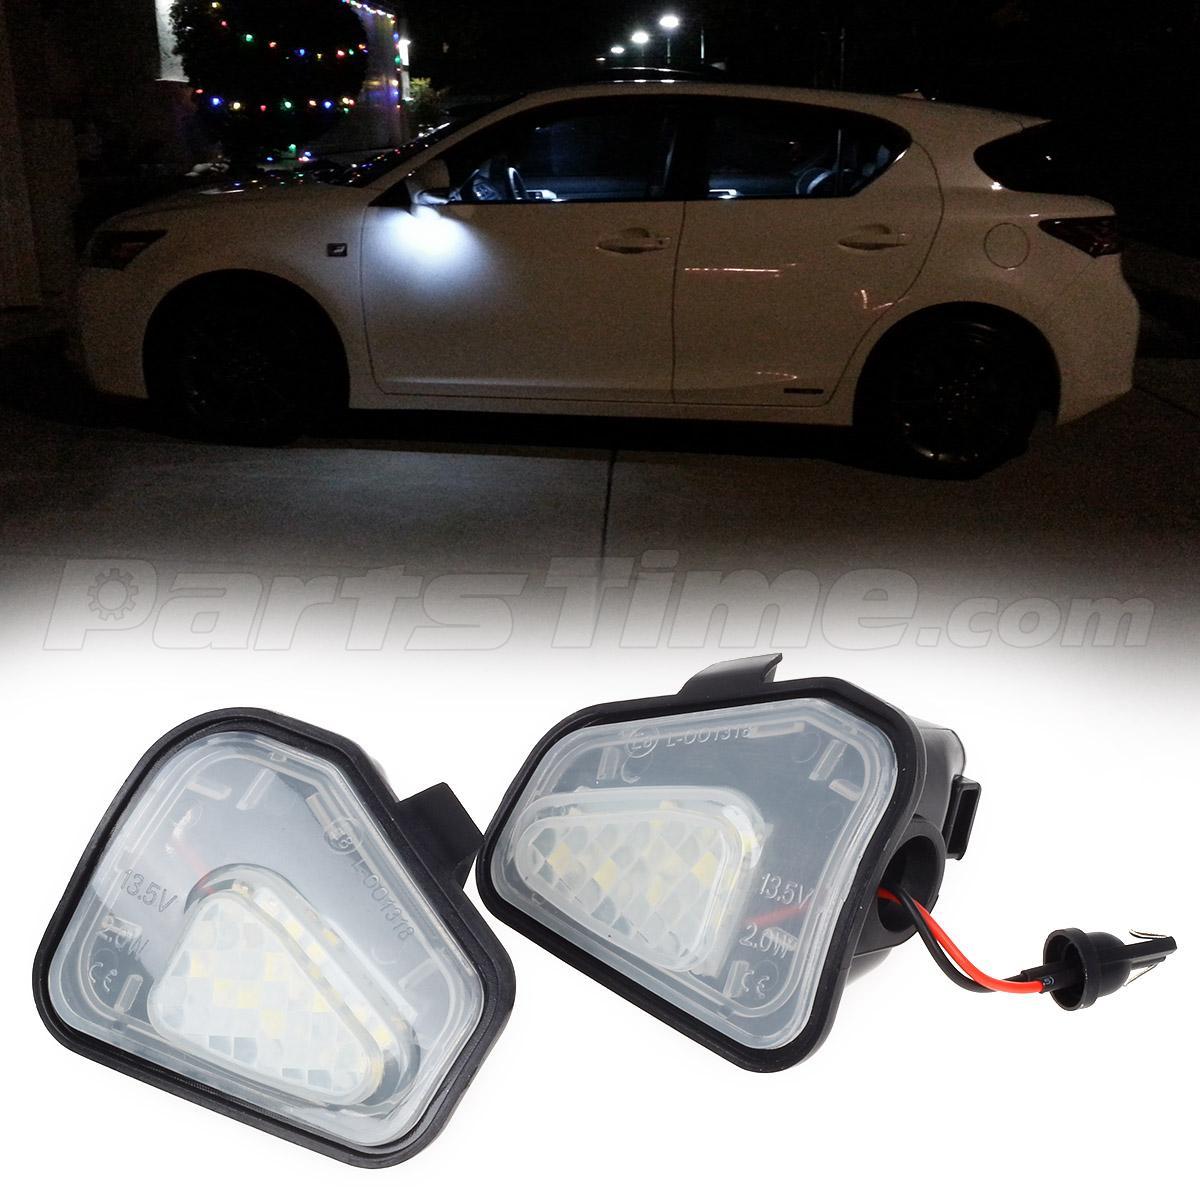 2pcs White Led Bulb Under Side Mirror Puddle Lights For Vw